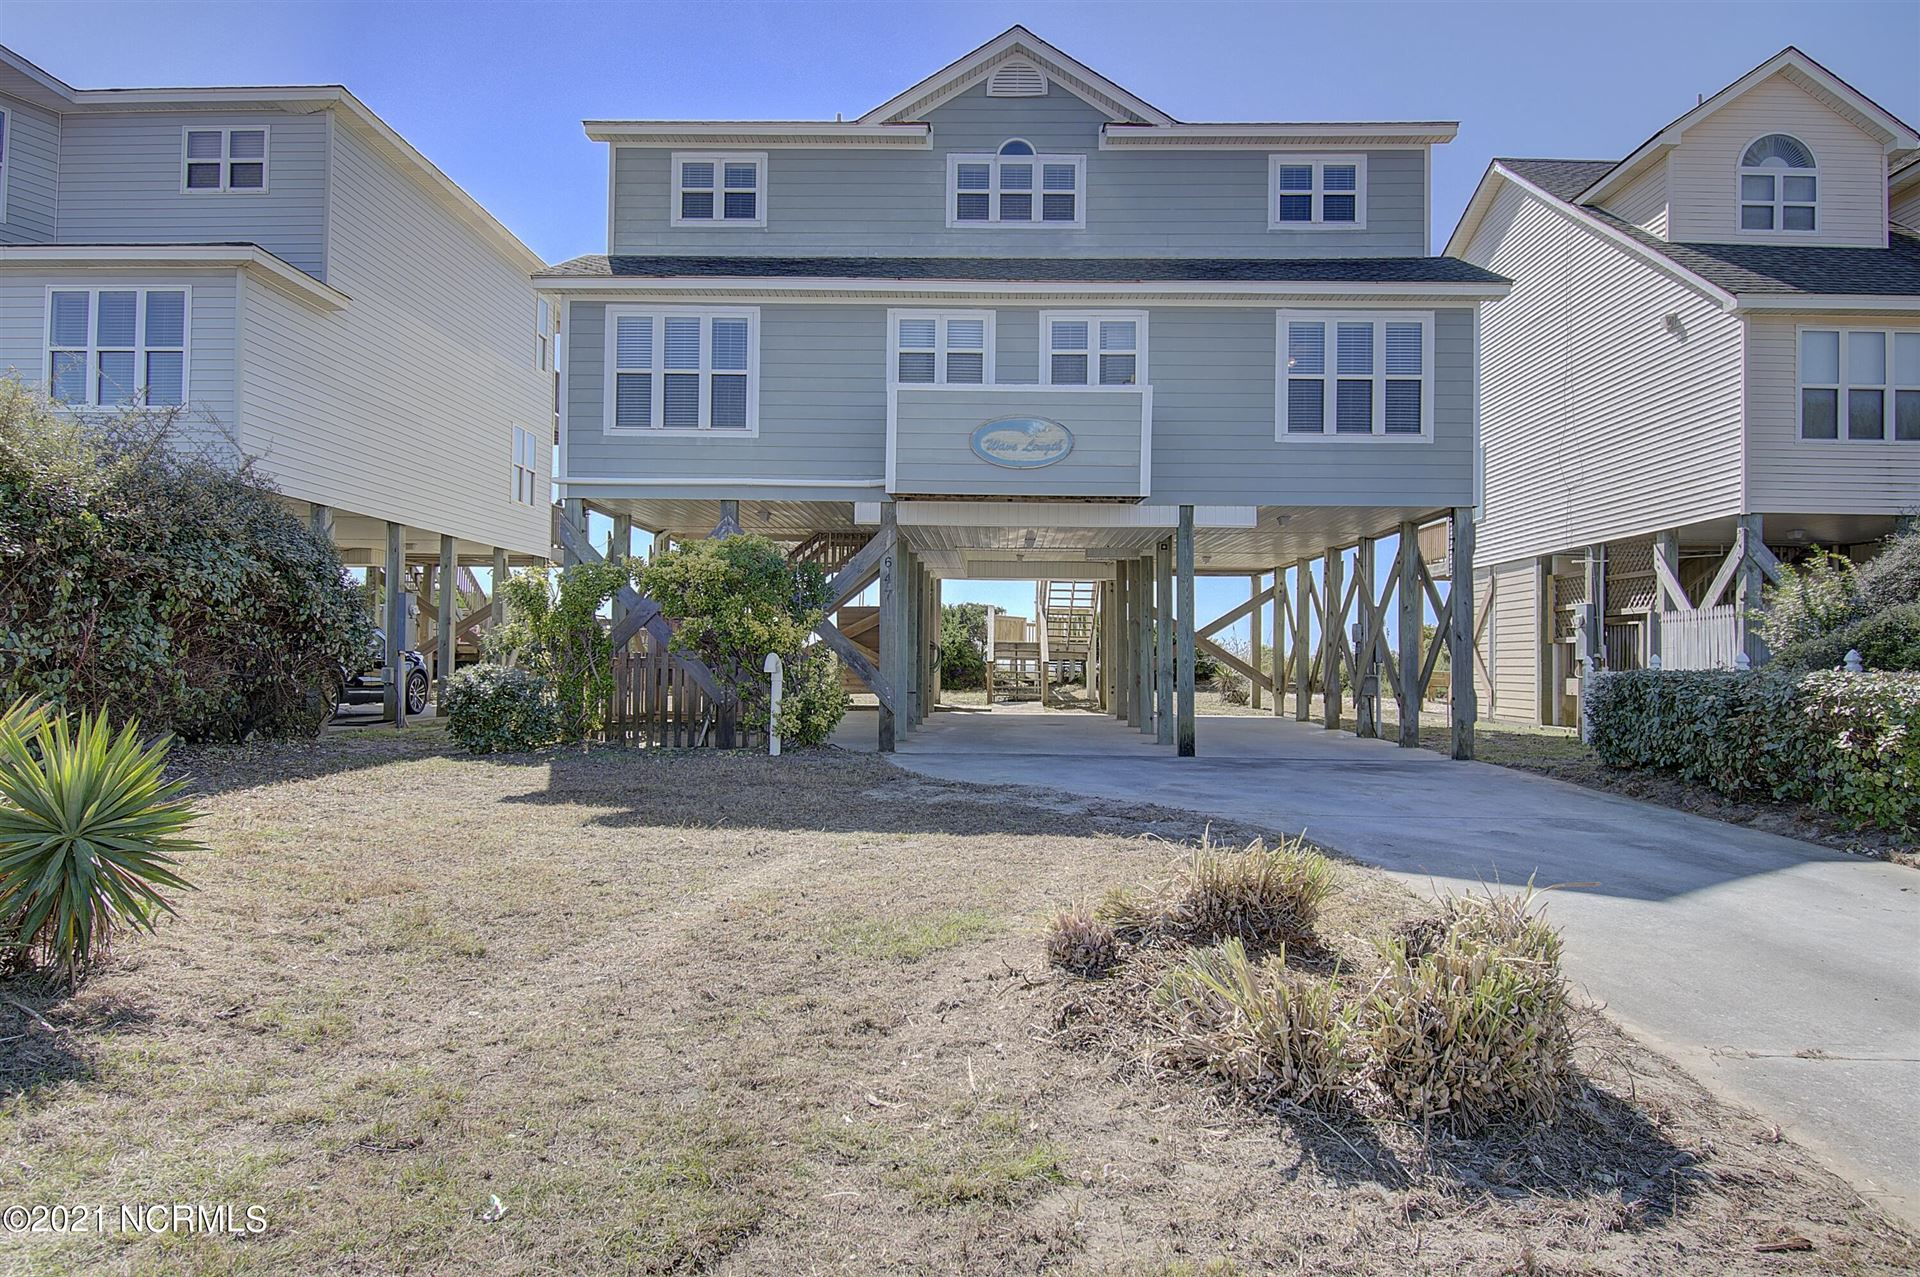 Photo of 647 Ocean Boulevard W, Holden Beach, NC 28462 (MLS # 100295592)